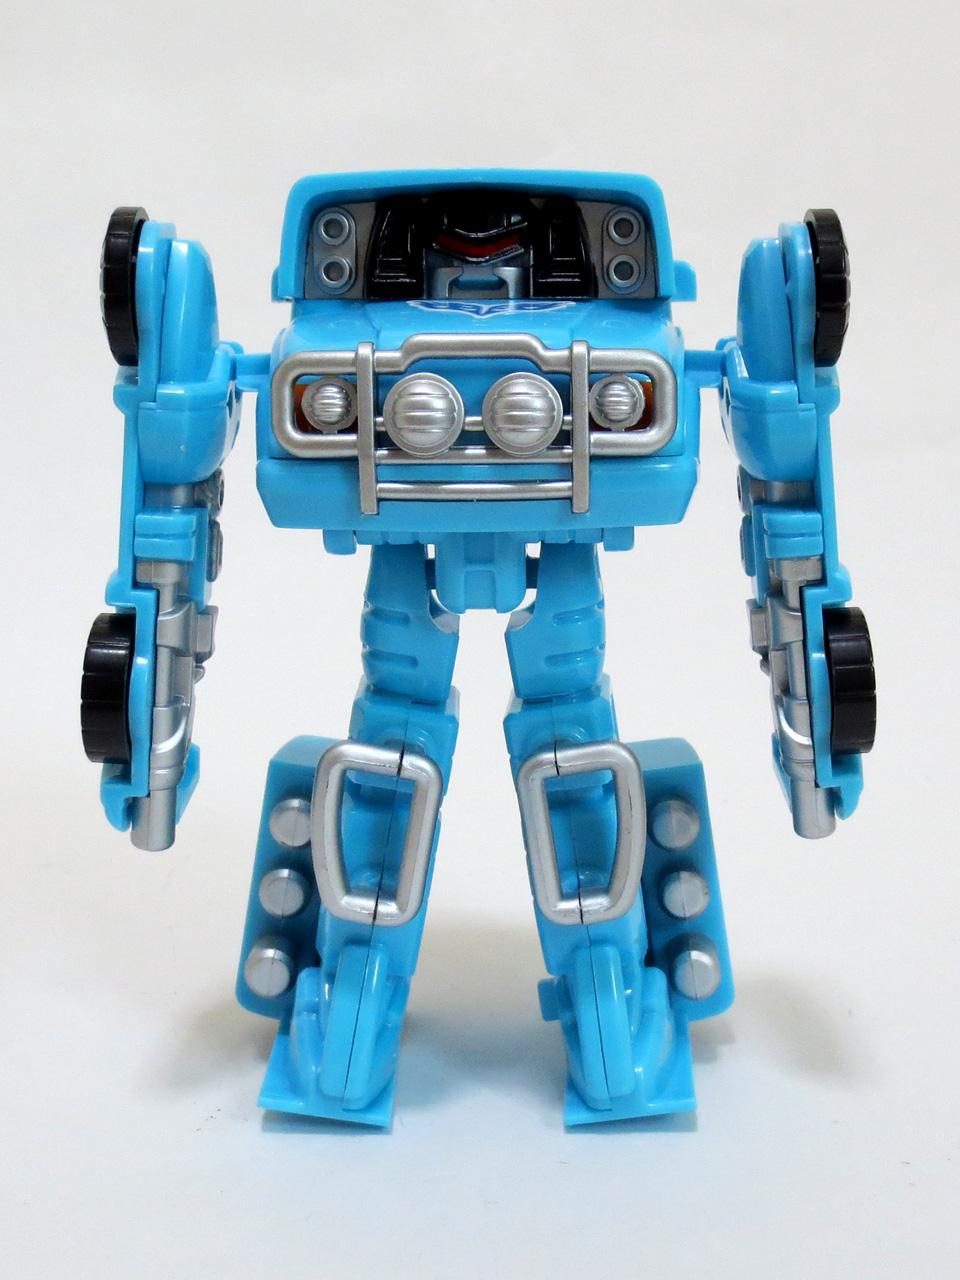 Robo_max_4wd_type_14.jpg